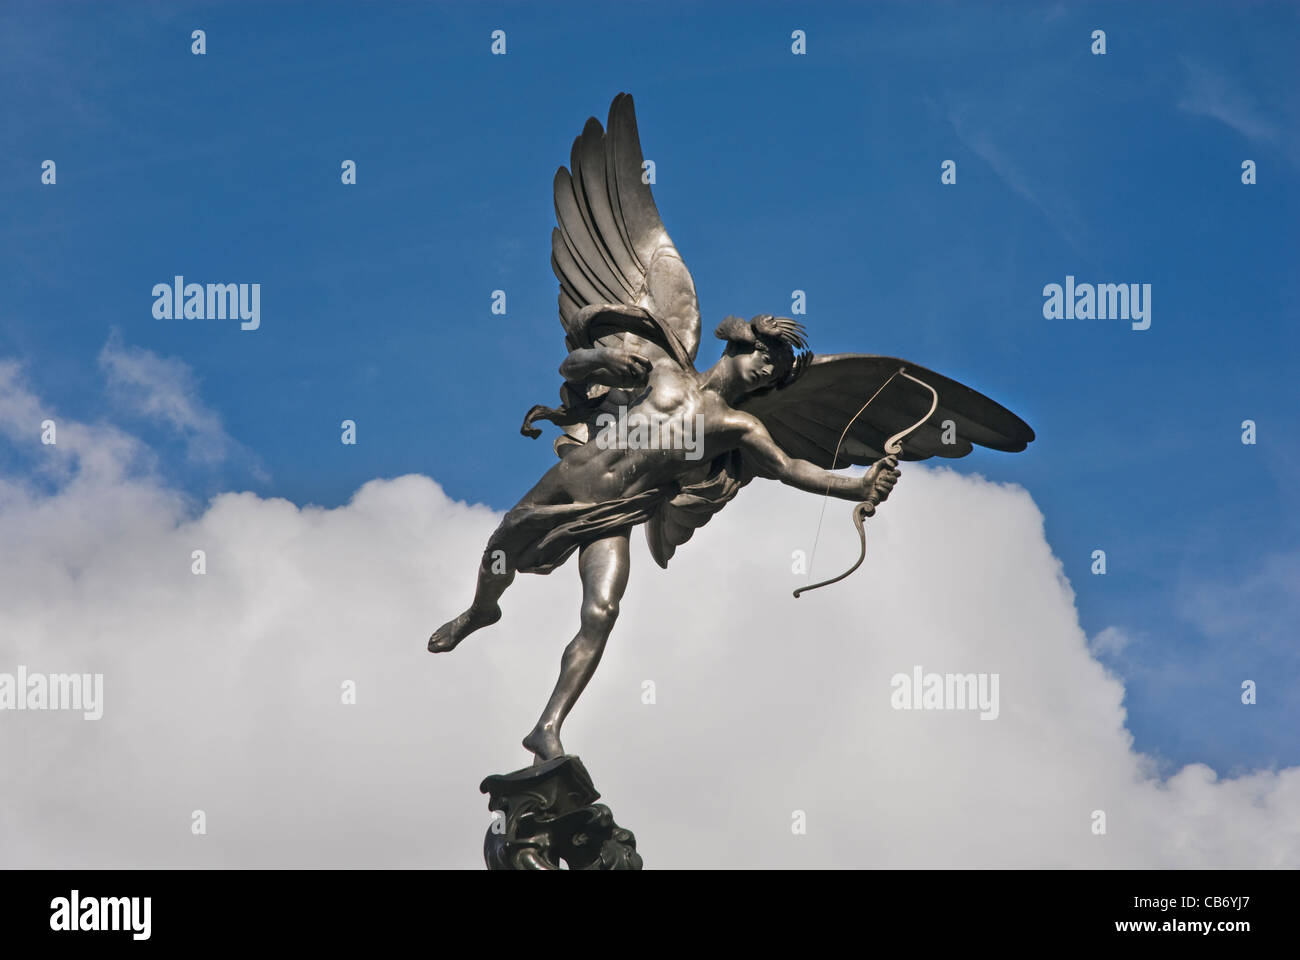 Eros statue. Picadilly Circus, London, England, UK. - Stock Image